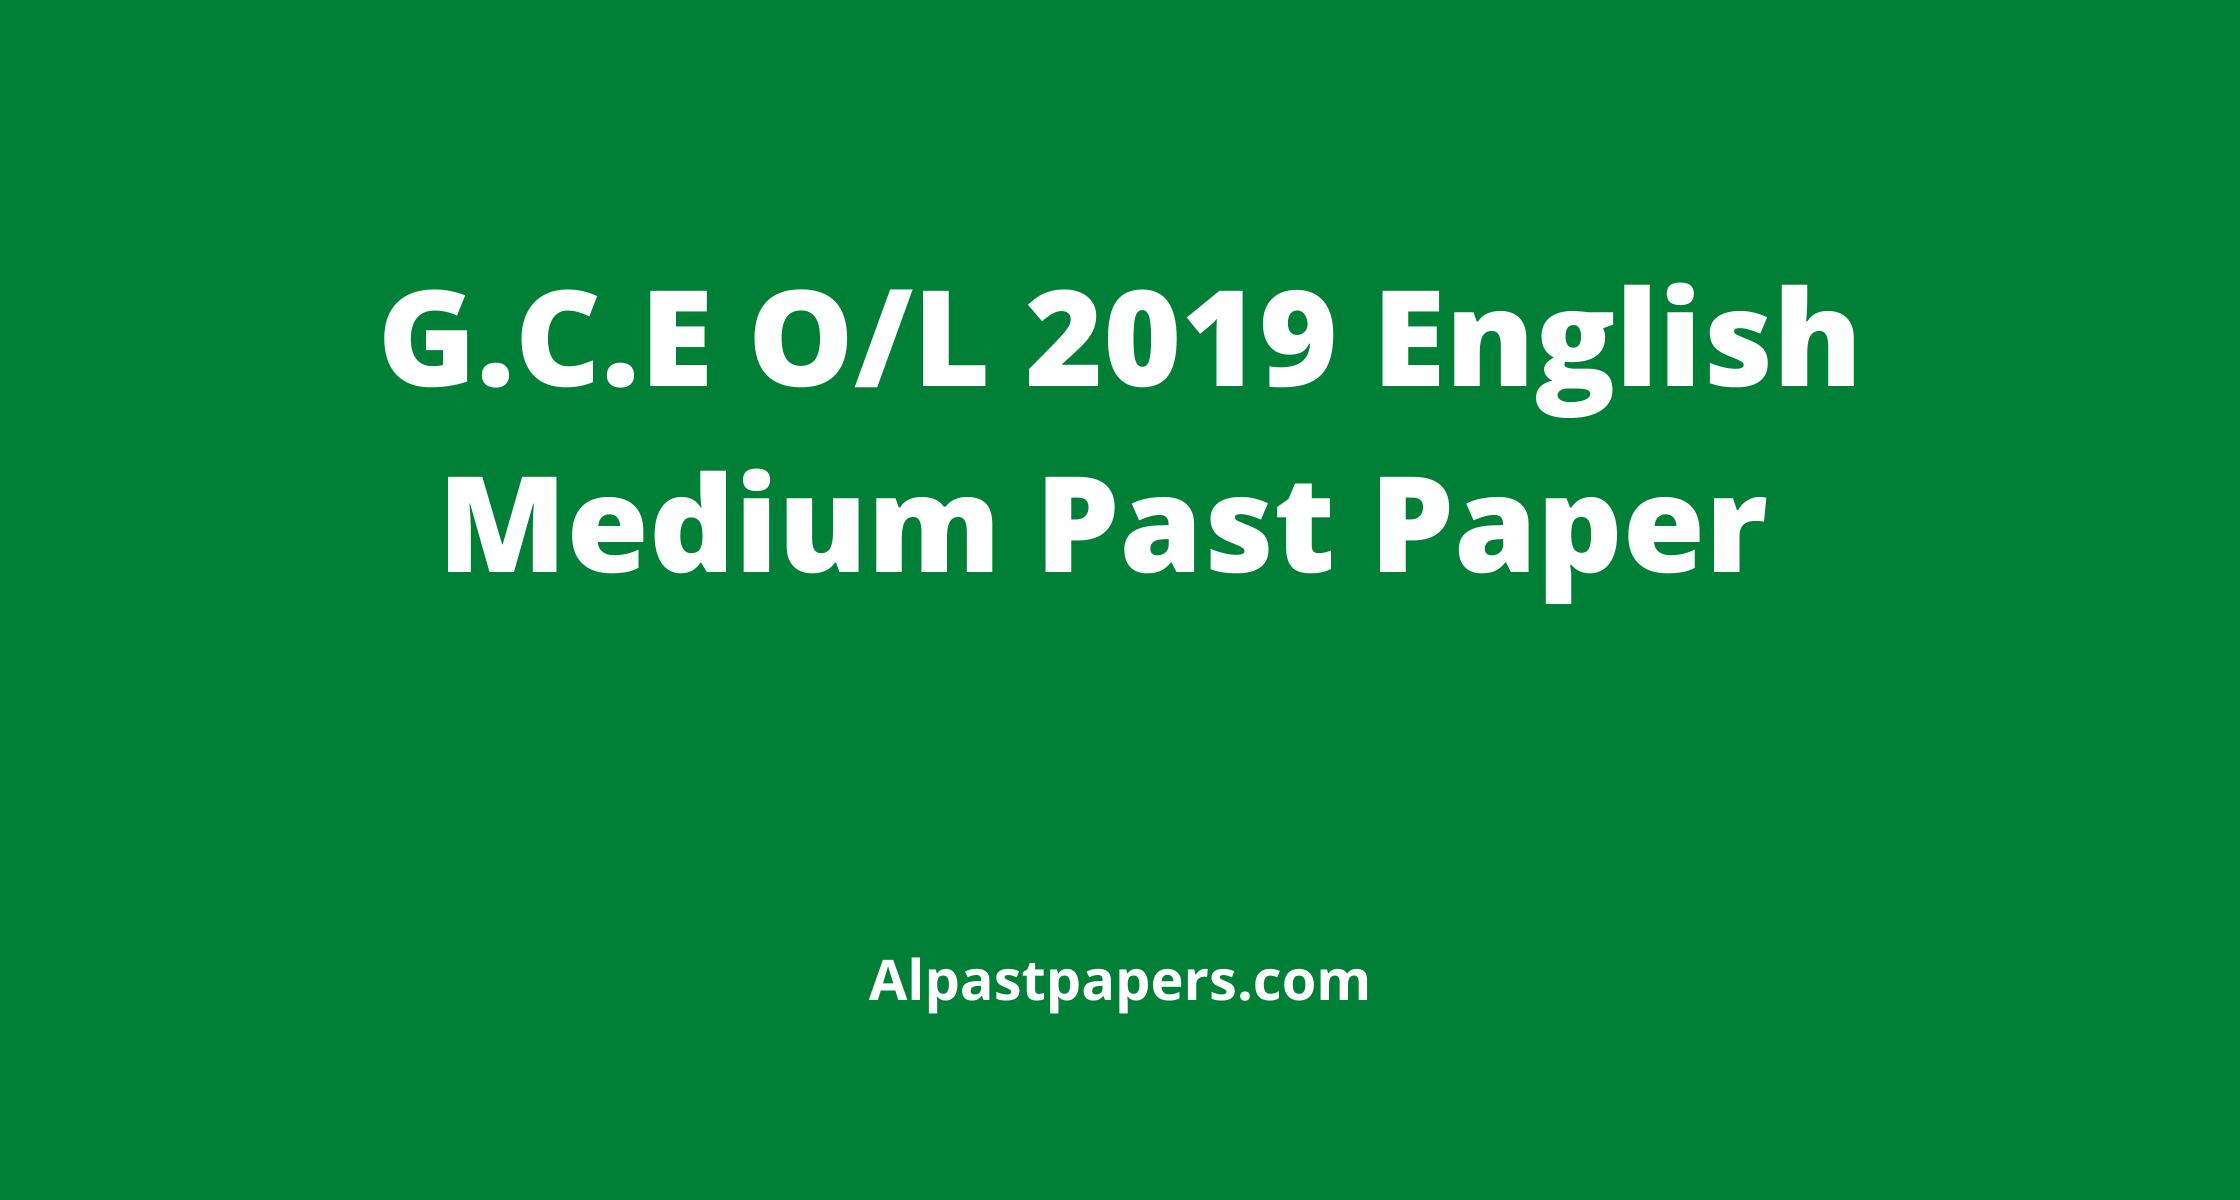 G.C.E-O_L-2019-O_L-English-Medium-Past-Paper-2